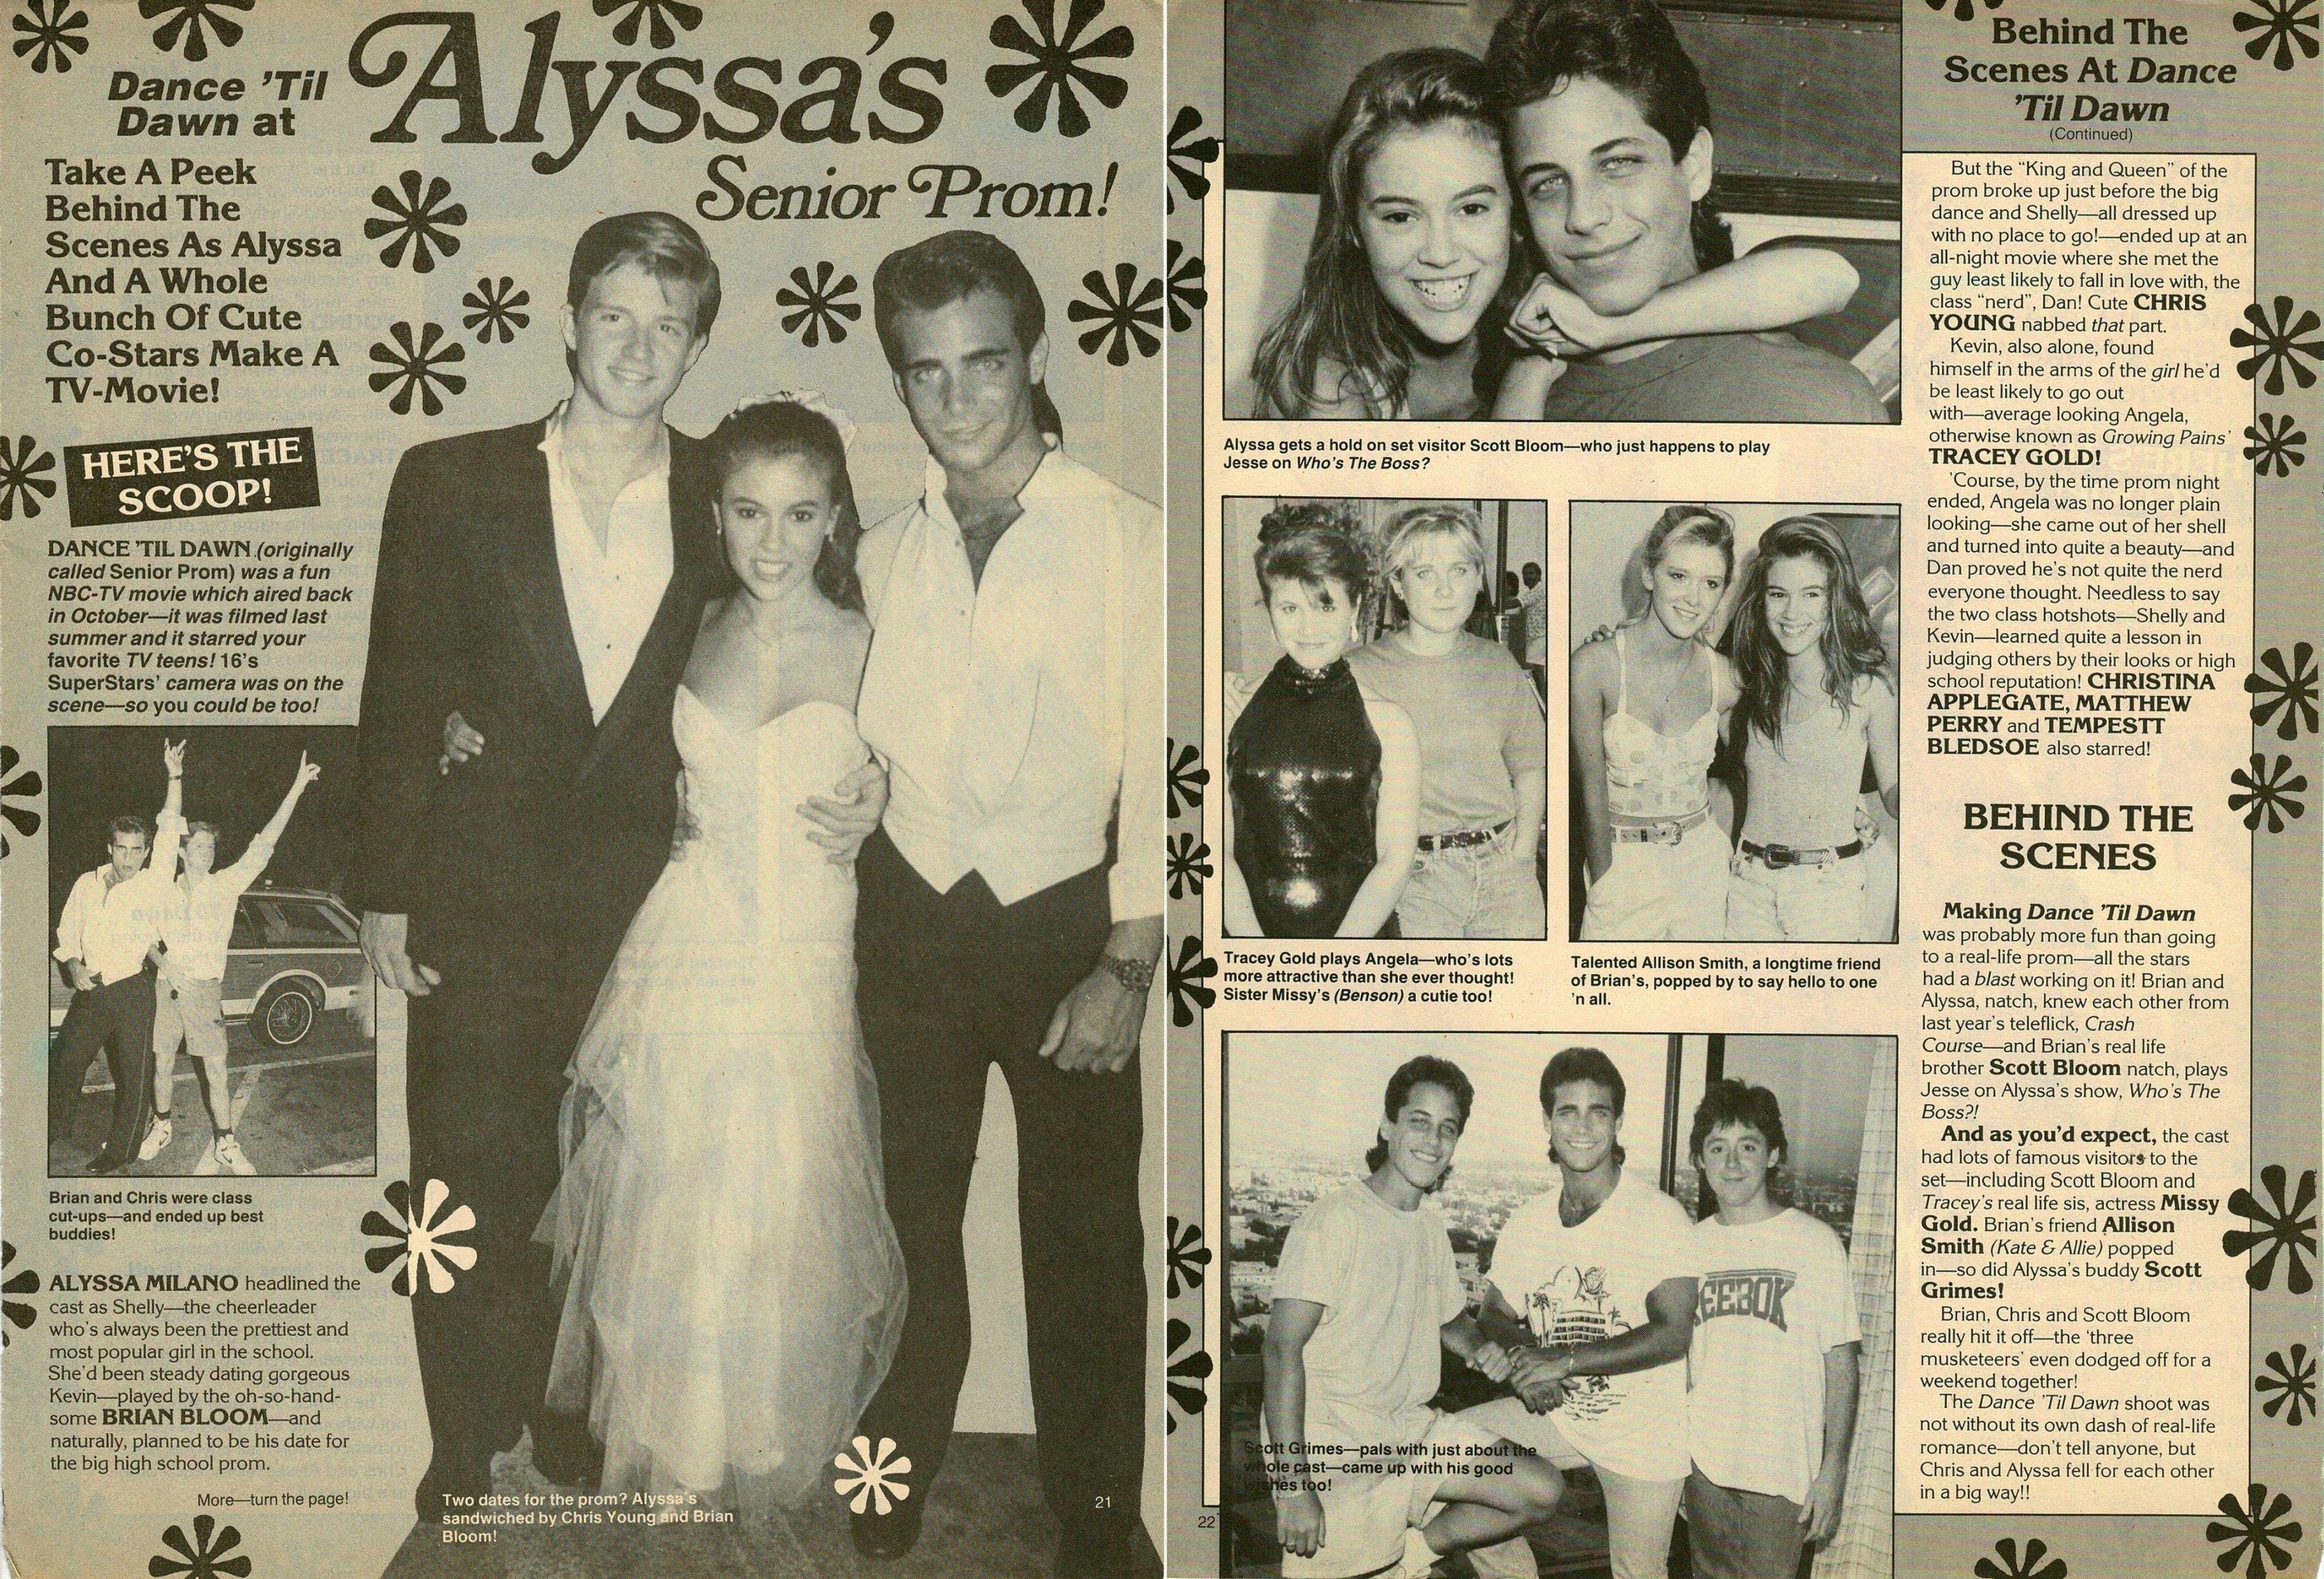 Alyssa Milano Movie Scenes behind the scenes article, in 16 superstars magazine, of